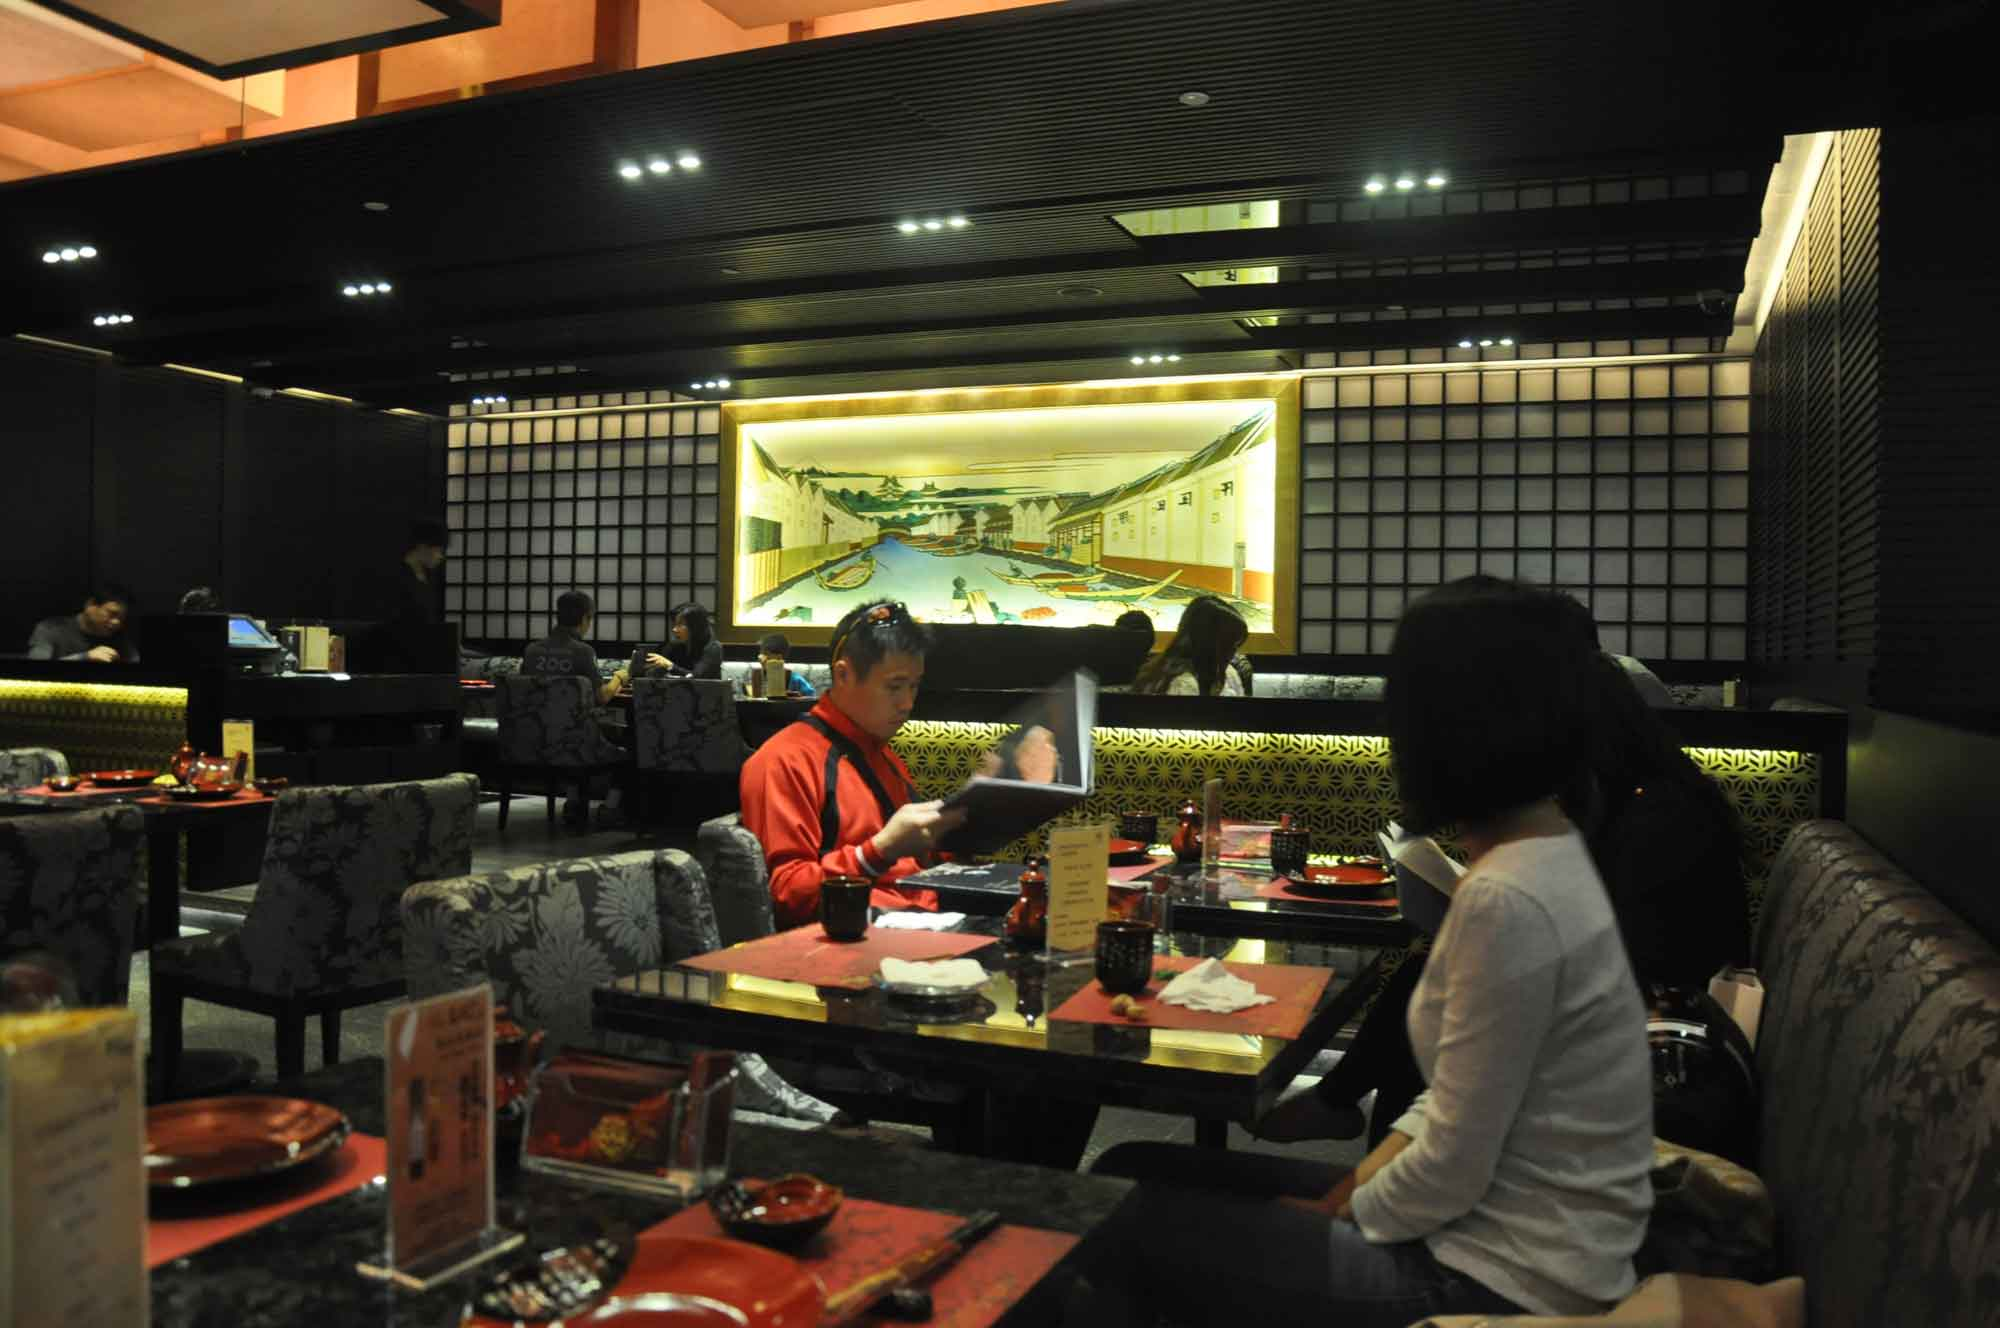 Fortuna Japanese Restaurant interior seating